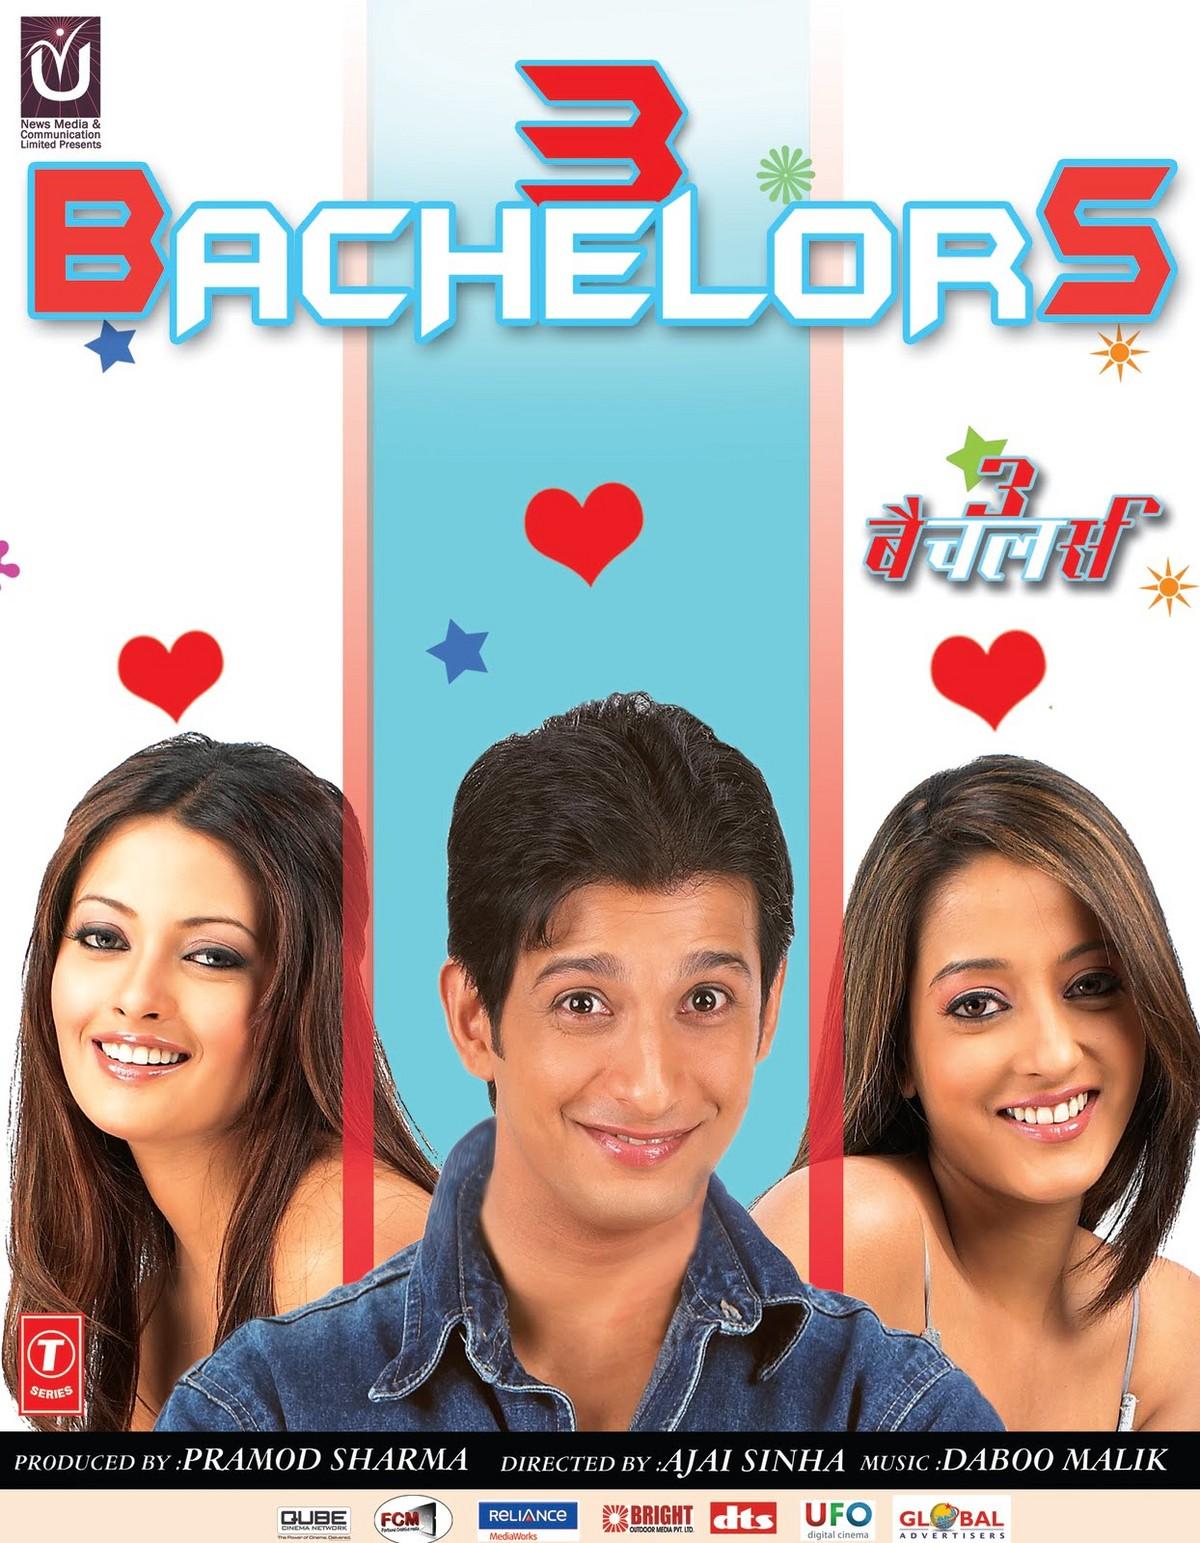 3 Bachelors - Movie Poster #1 (Original)